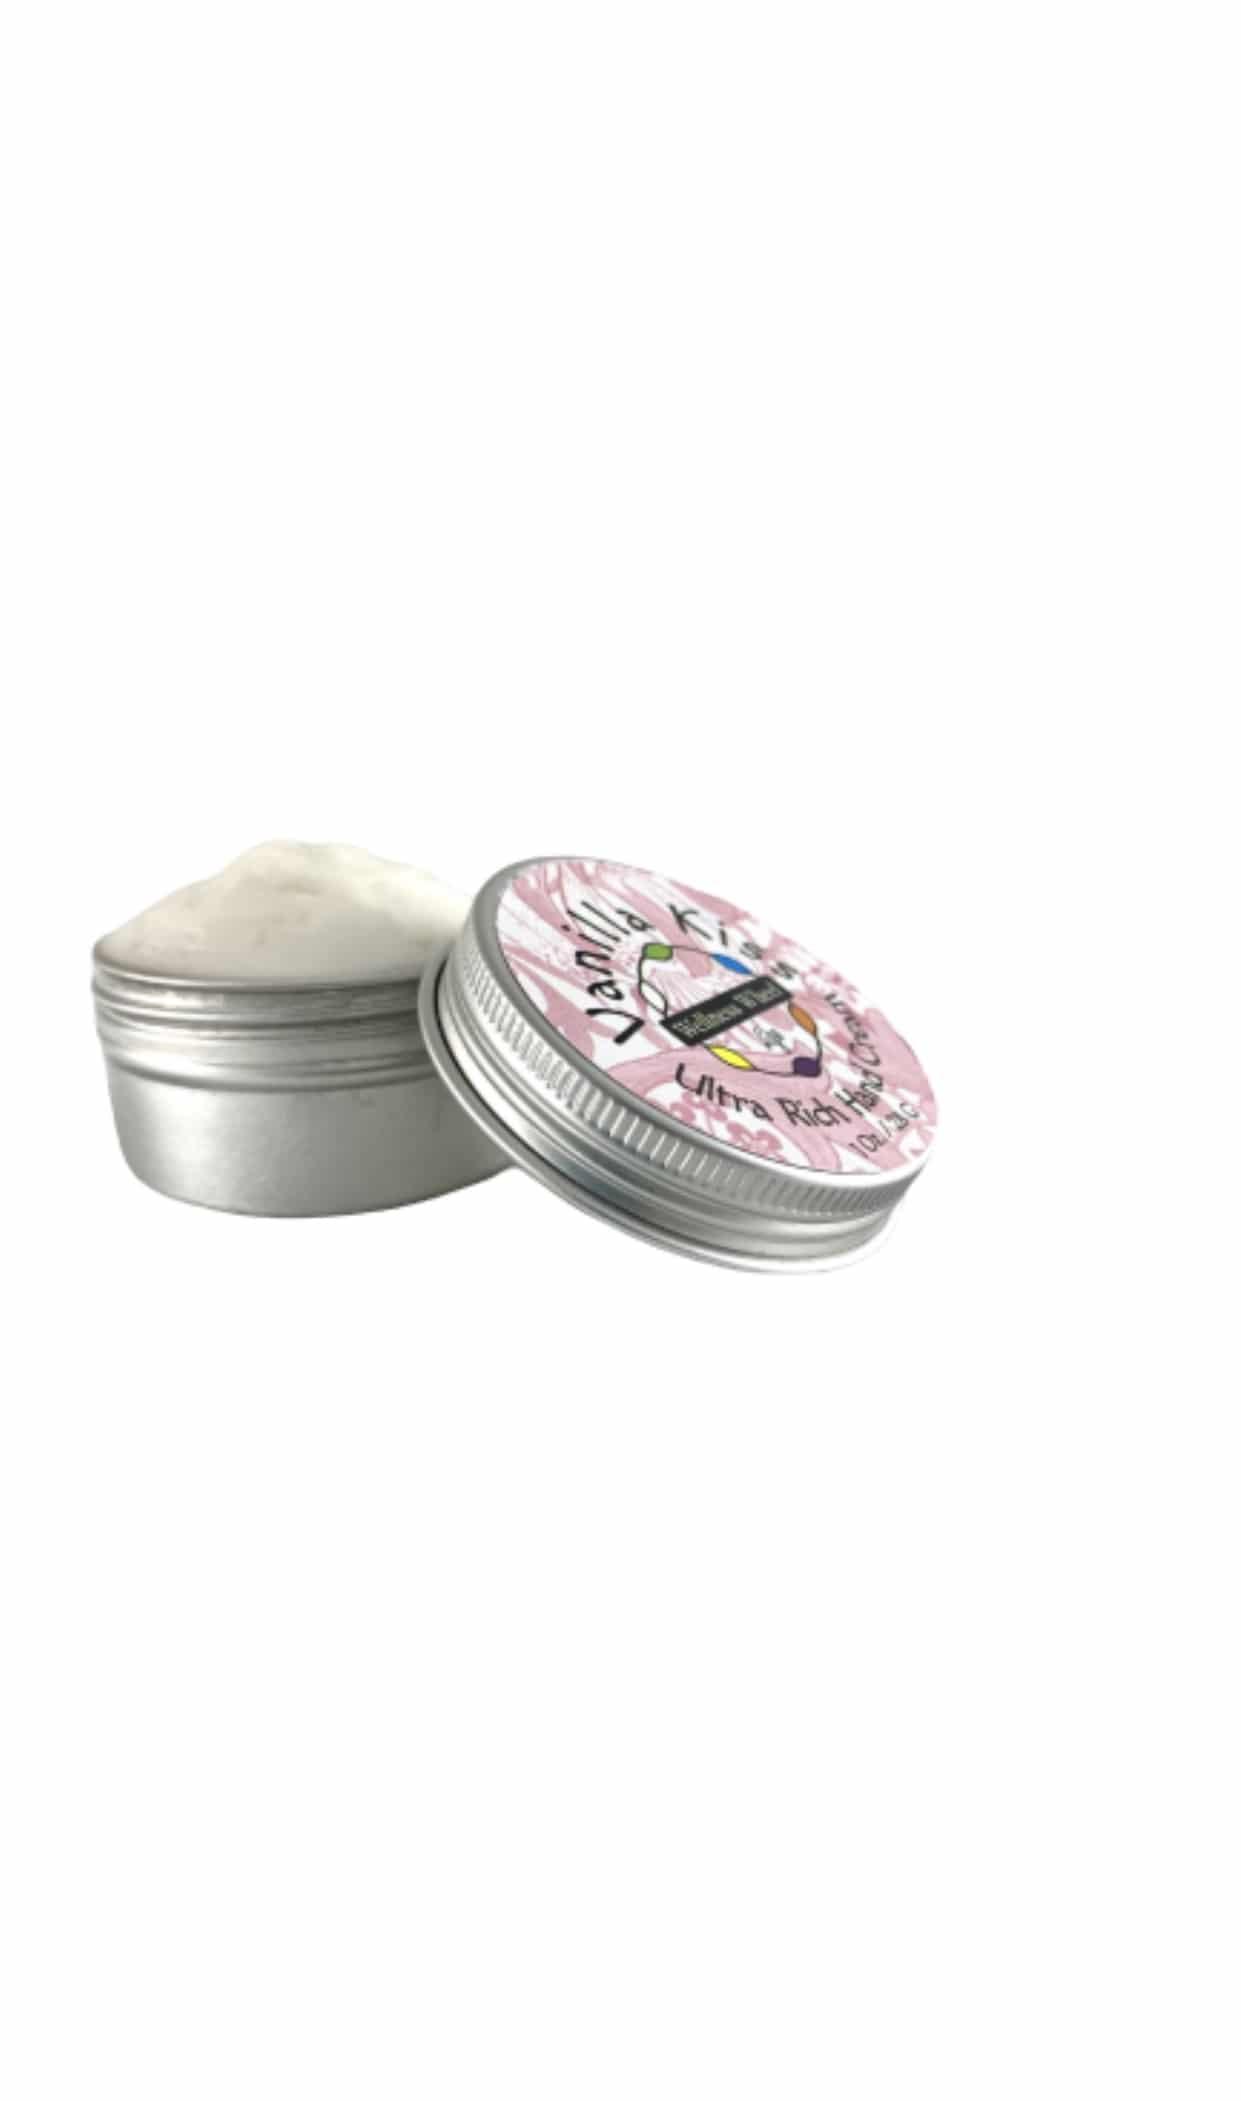 Ultra Rich Hand Cream In Vanilla Kiss